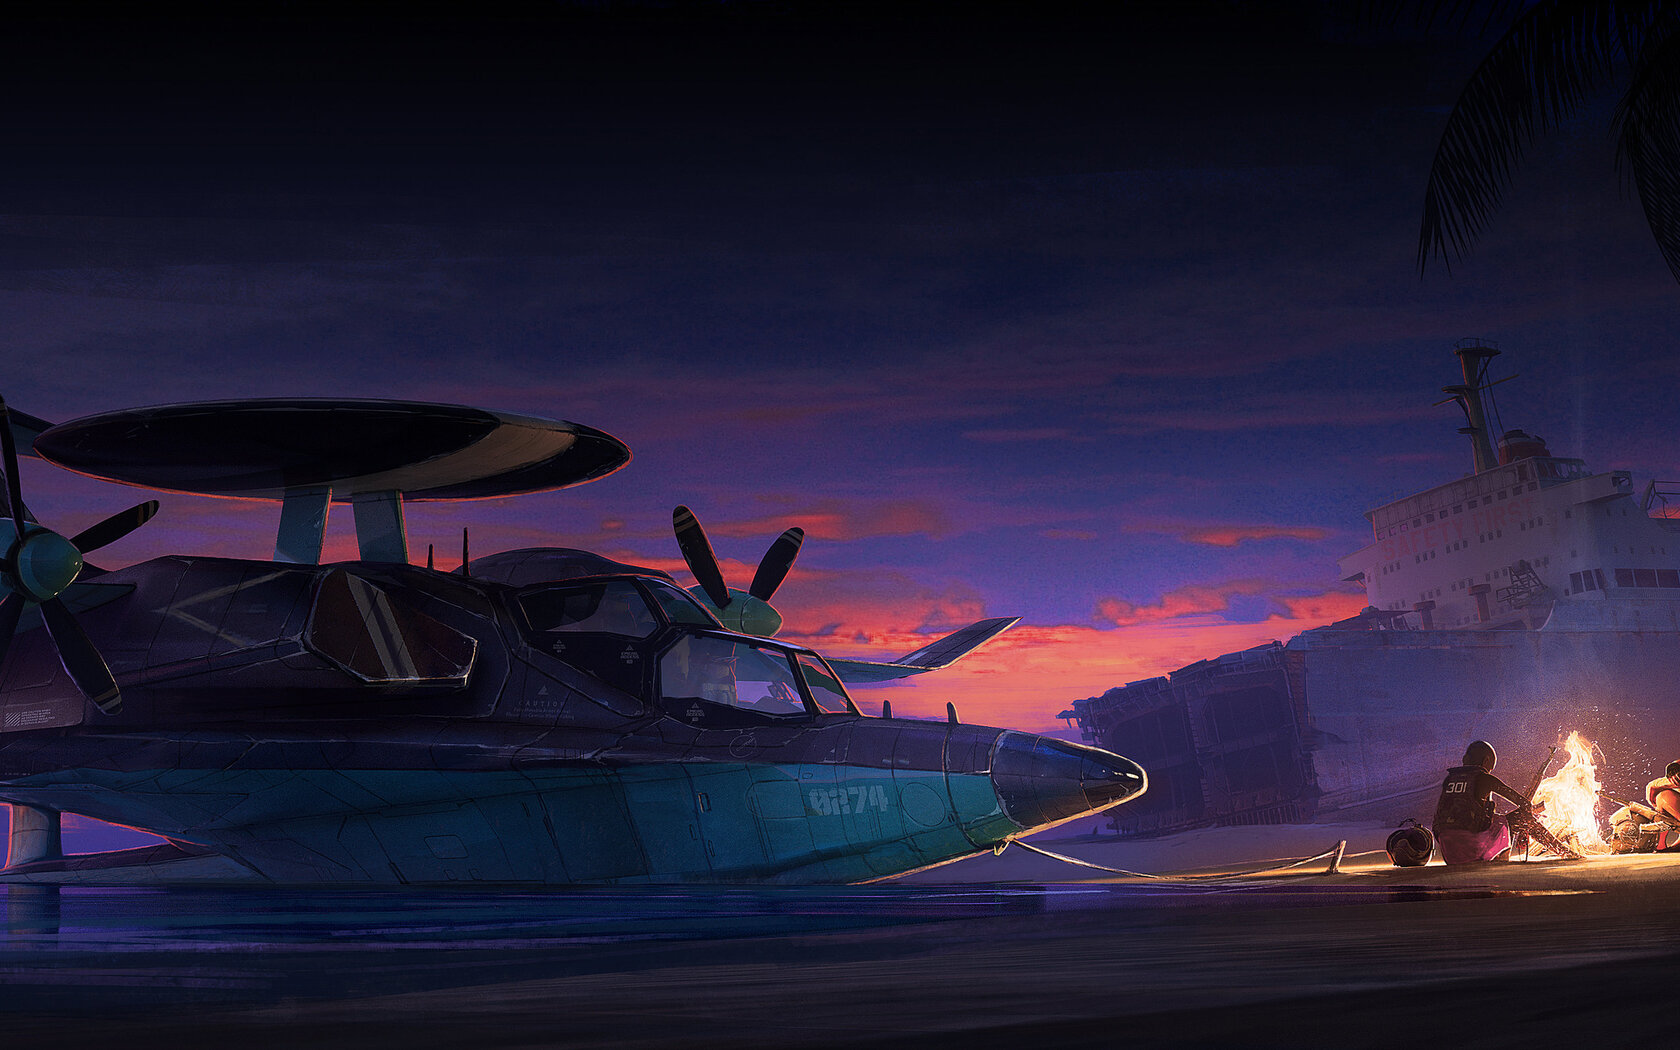 airplane-beach-cargo-dusk-ocean-79.jpg